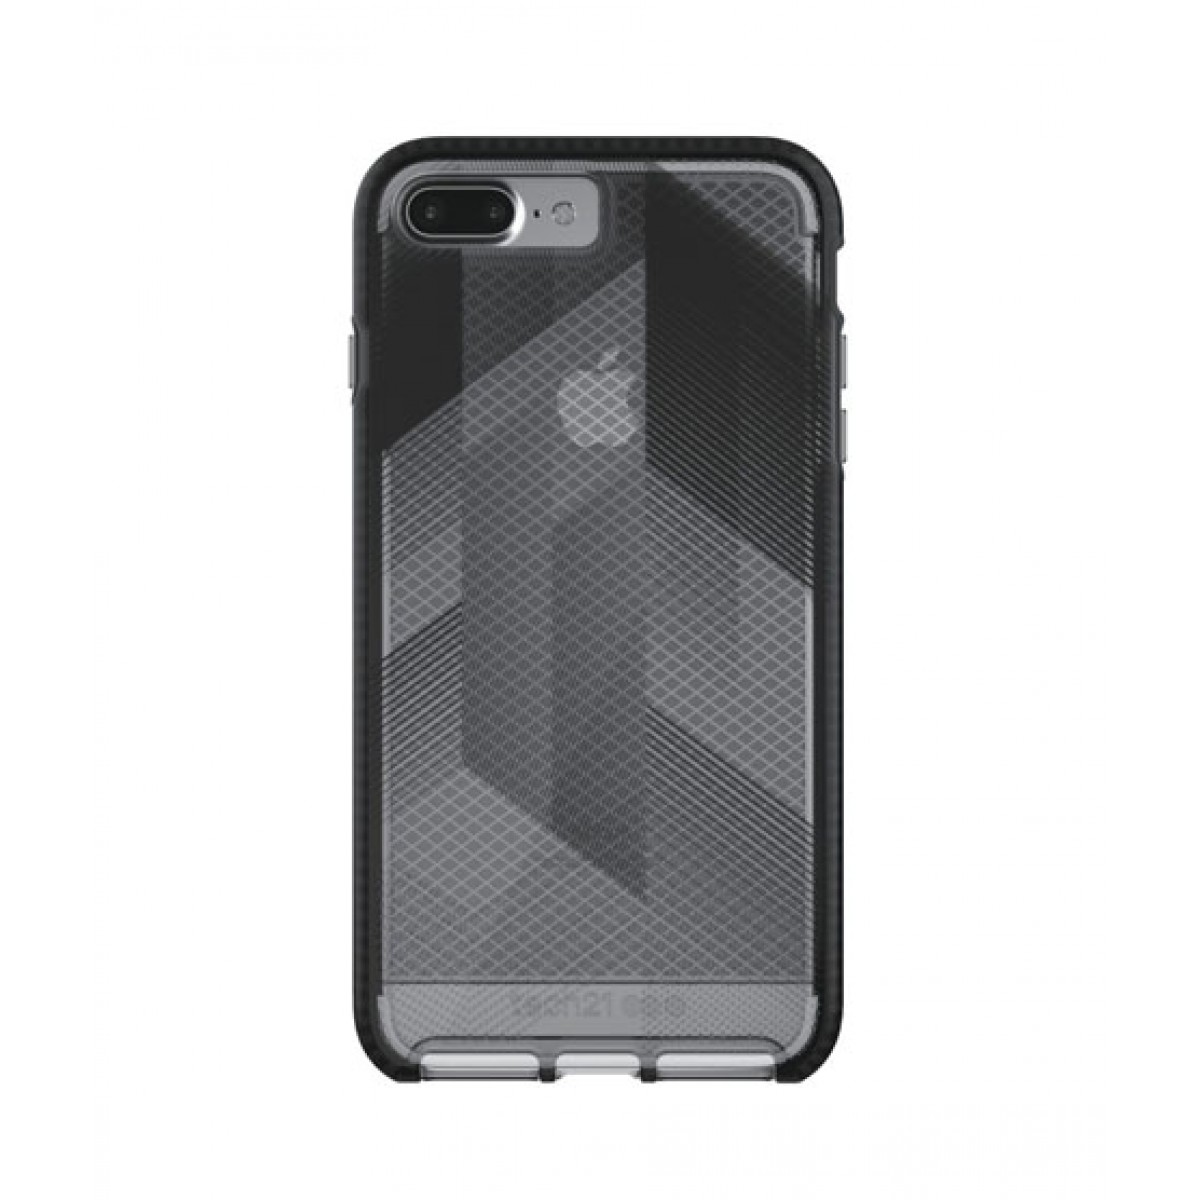 pretty nice 52b52 fca3a Tech21 Evo Check Urban Edition Smokey/Black Case For iPhone 8 Plus